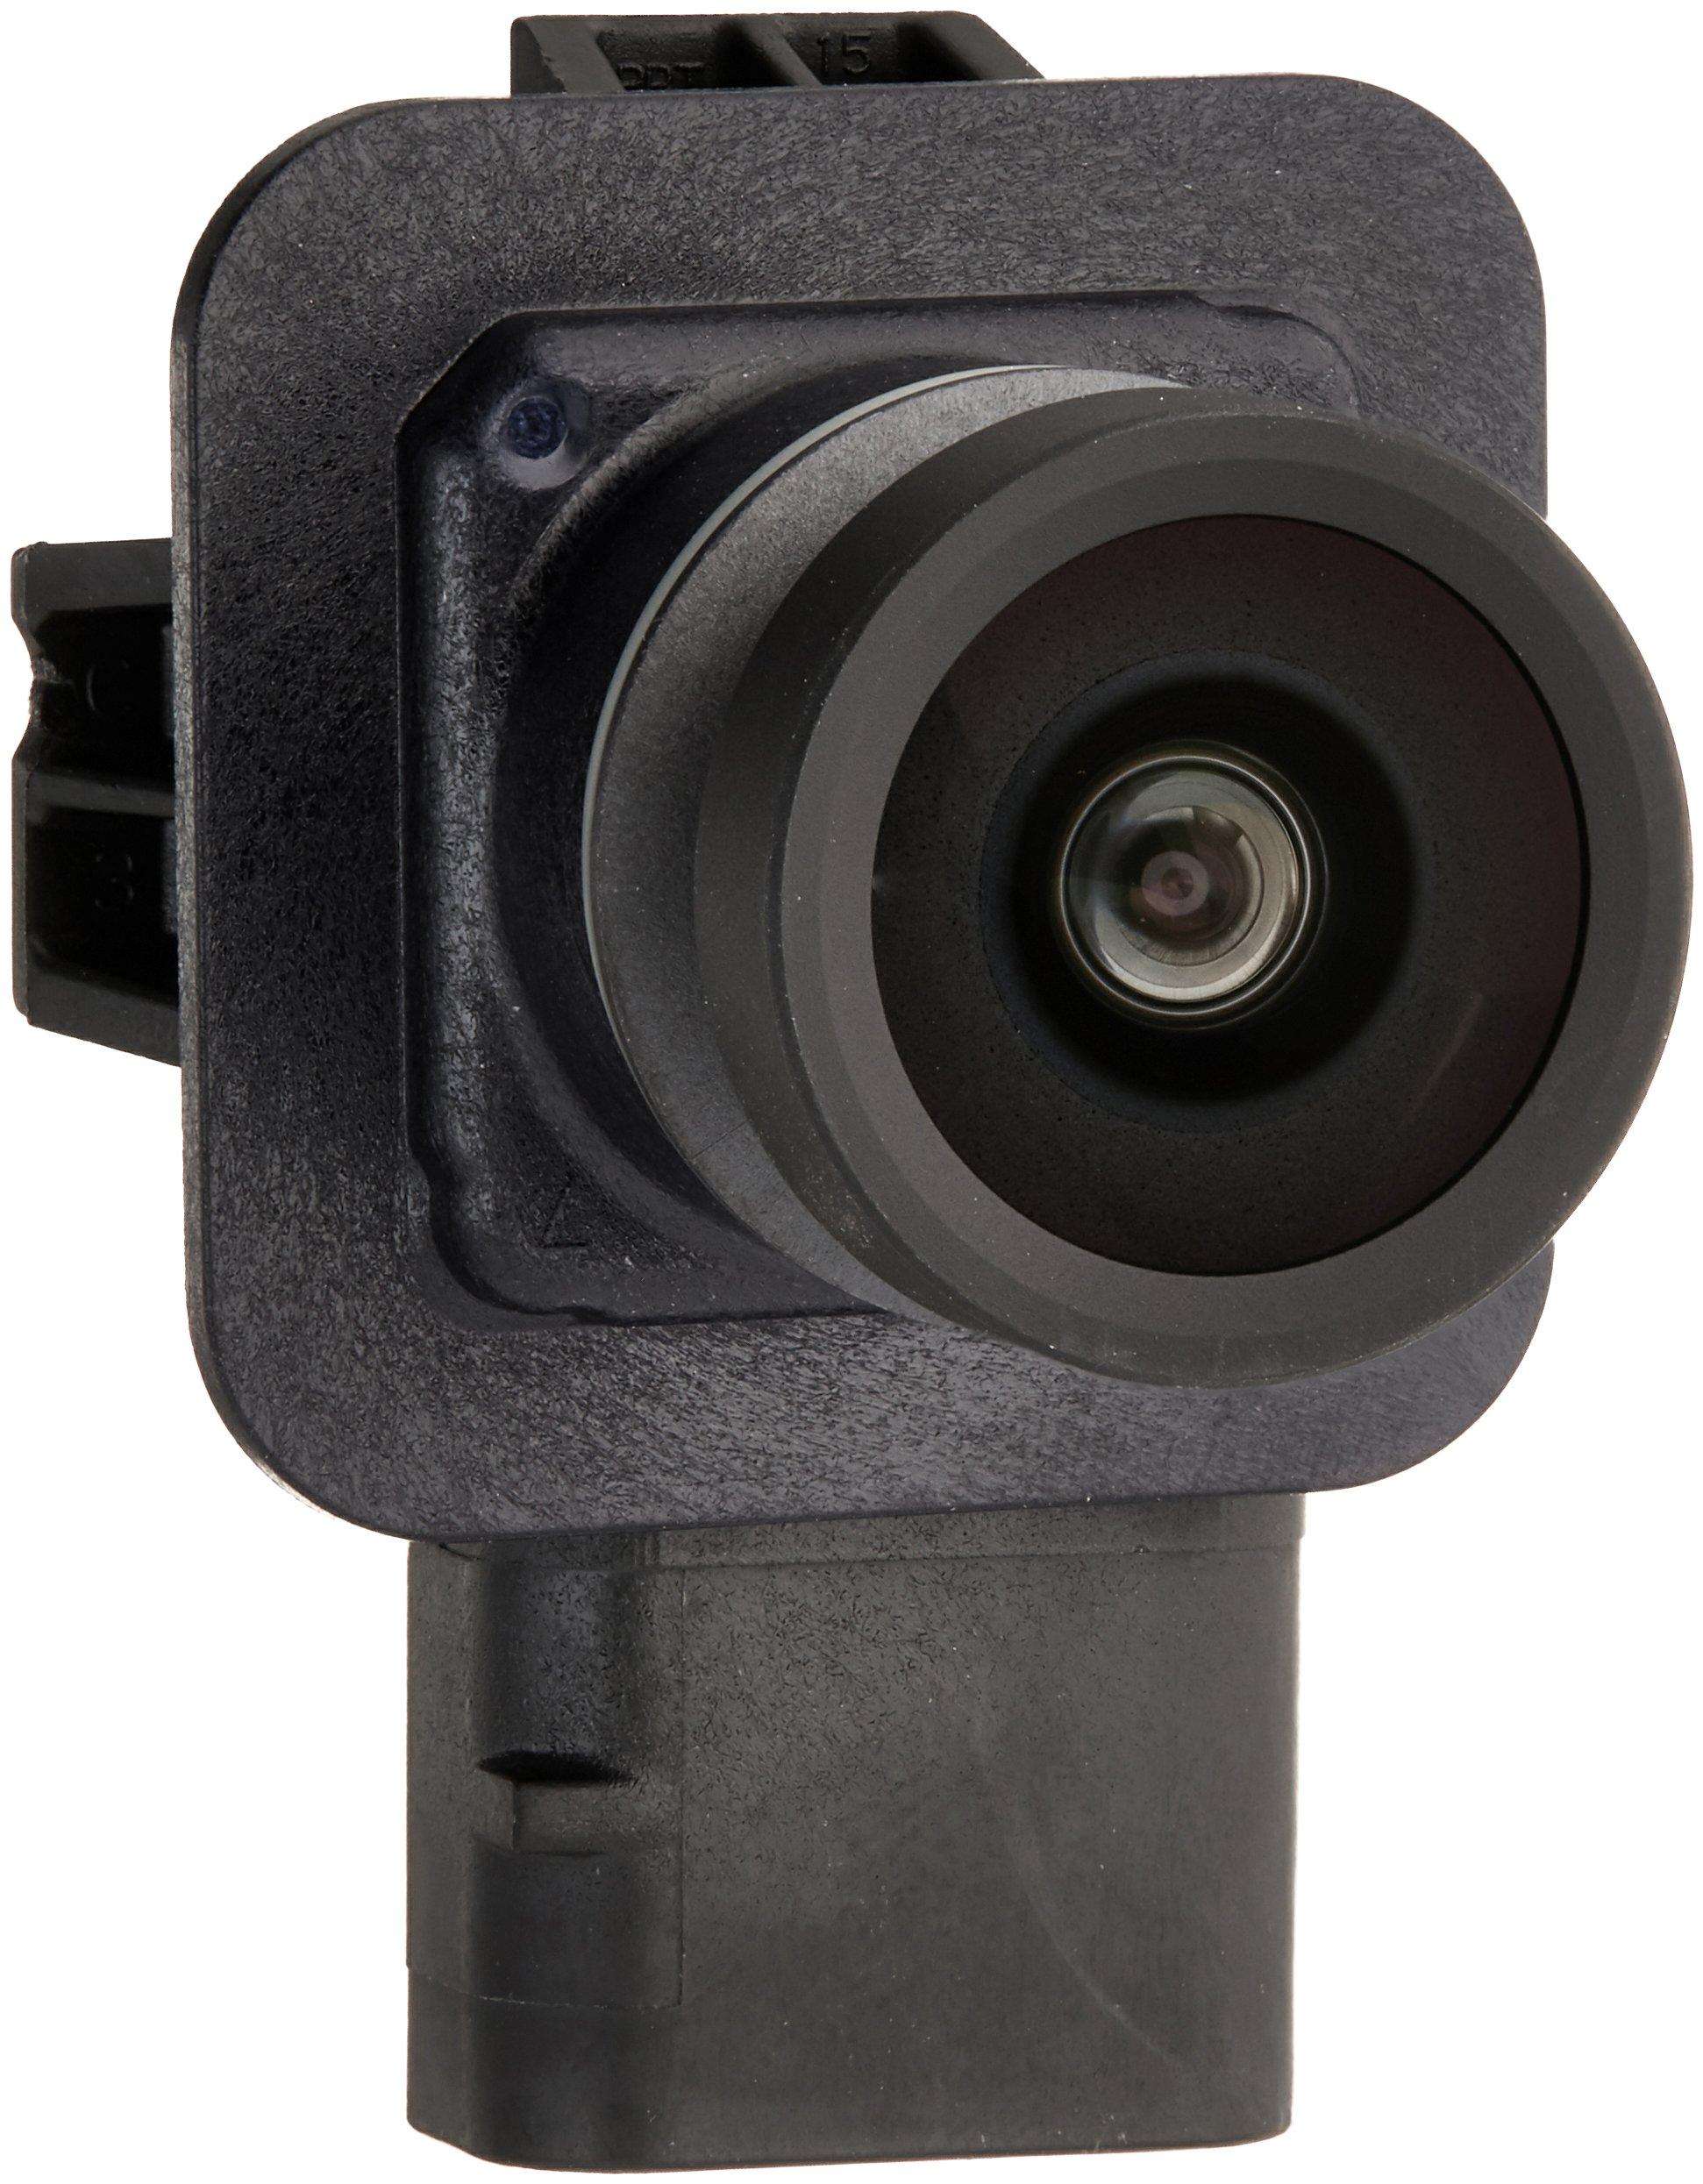 Ford BT4Z-19G490-B Back Up Rear Reverse Parking Camera